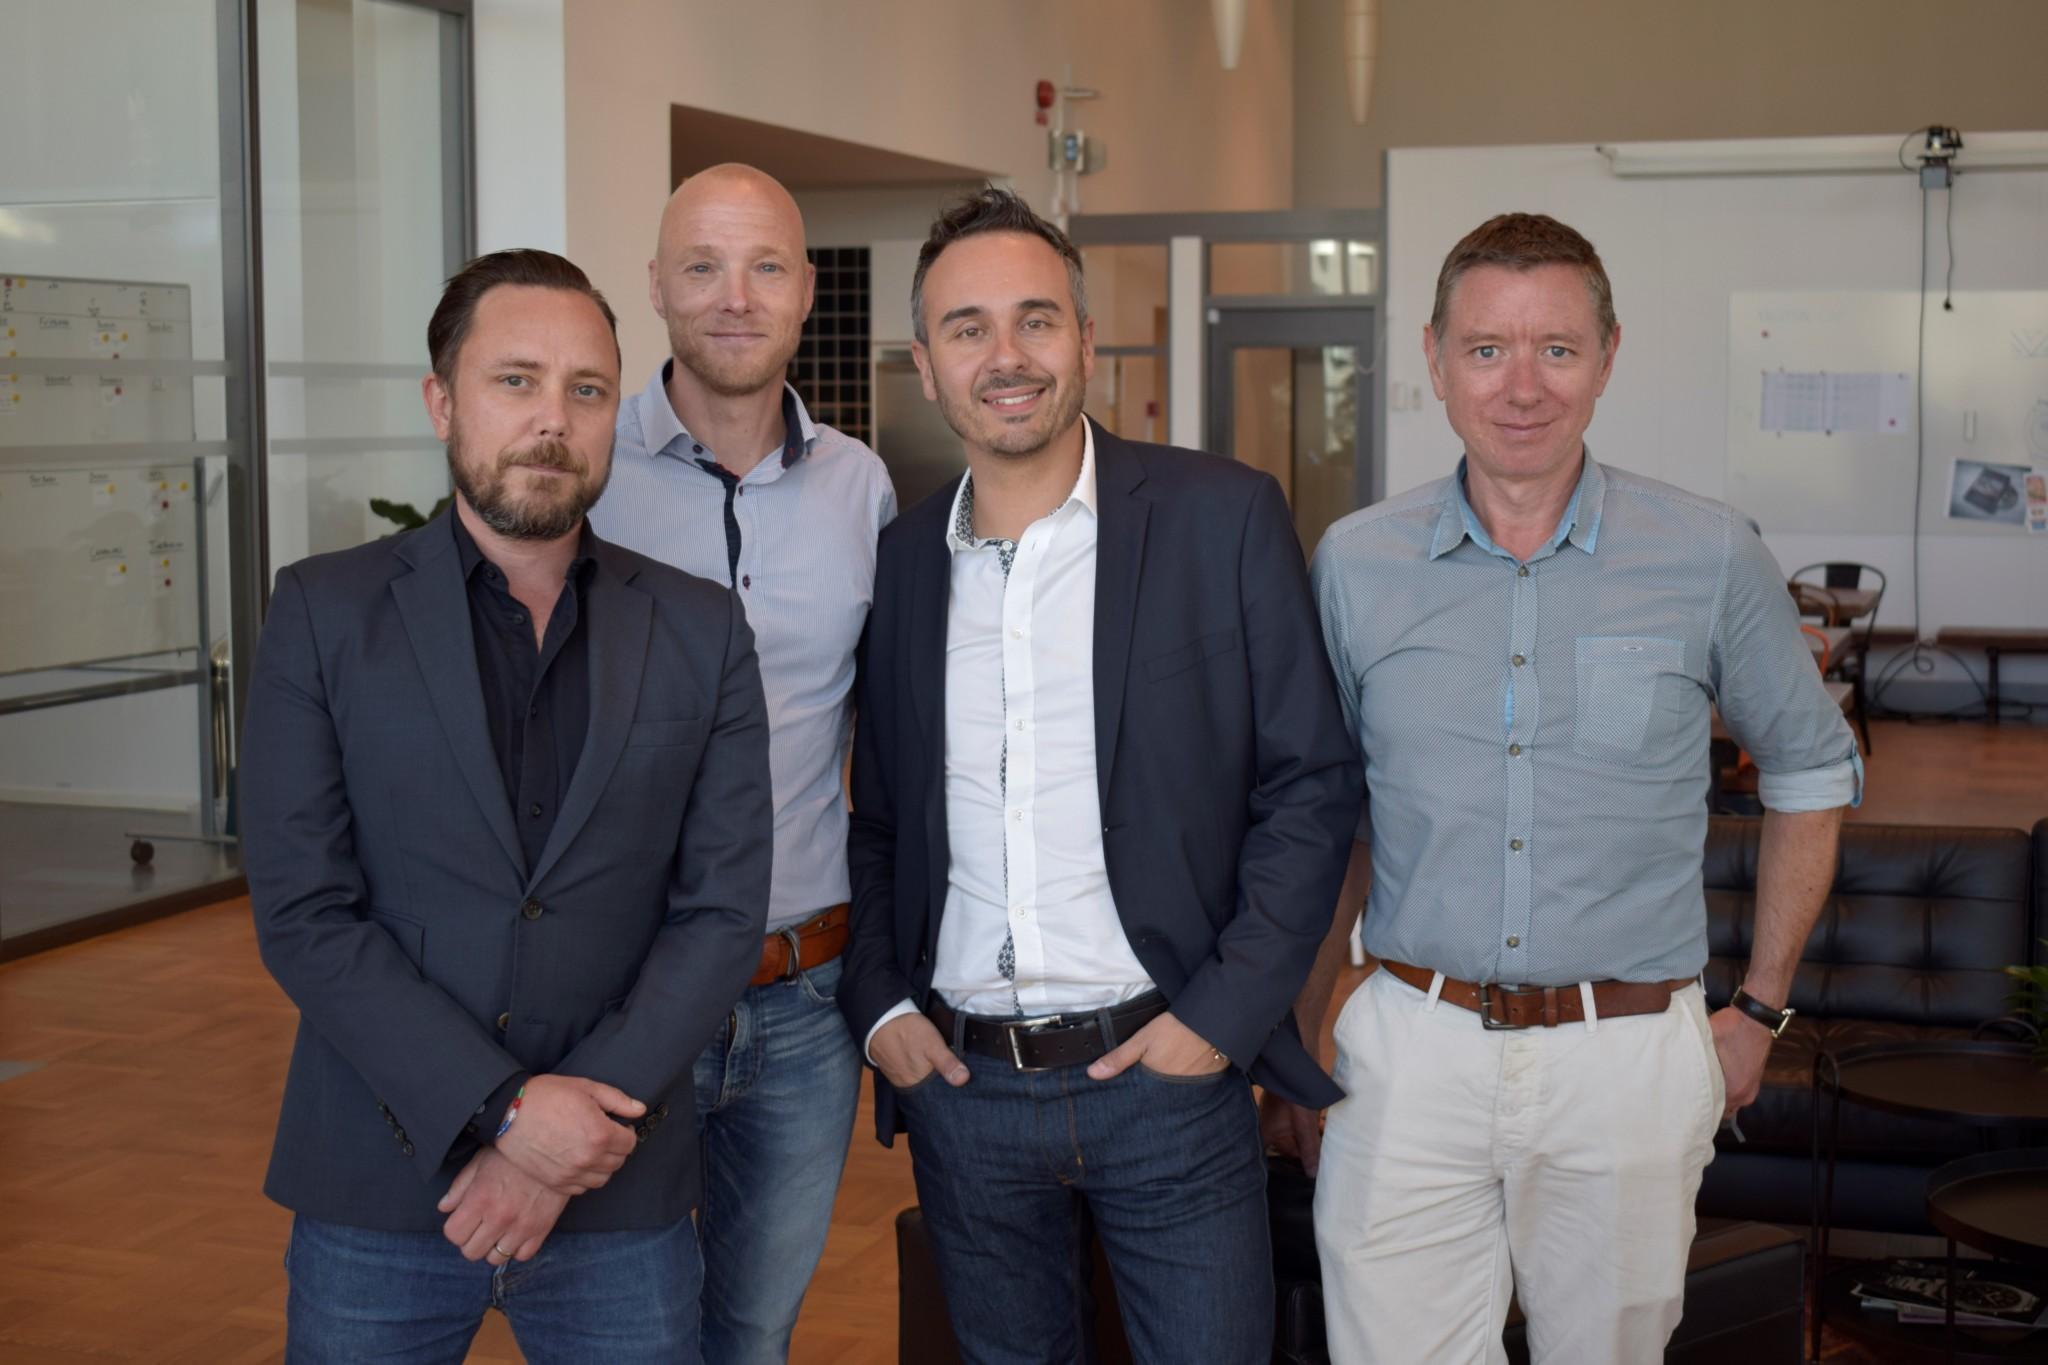 Left to right: Mats Larsson,  Henrik Telander, Sarandis Kalogeropulos, and WatchPro managing editor Rob Corder at Kronaby's headquarters.